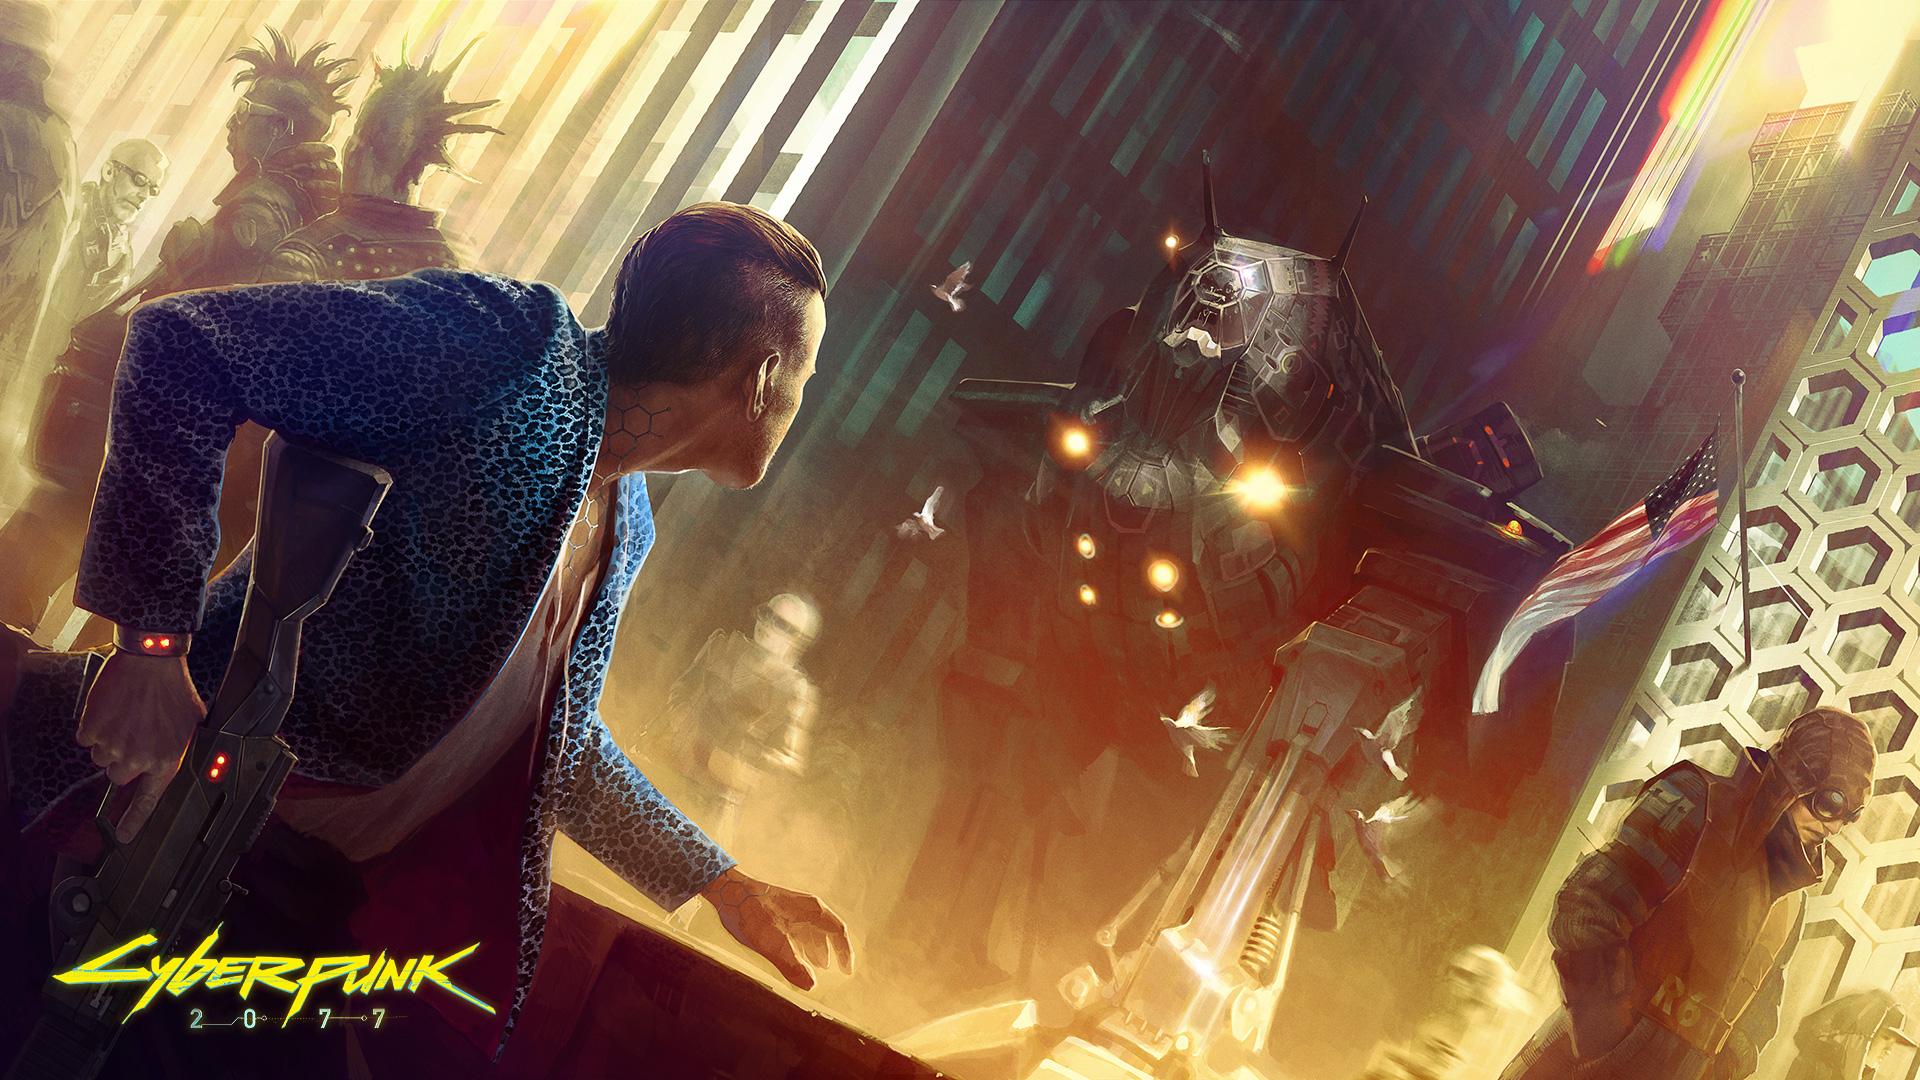 upcoming cyberpunk games